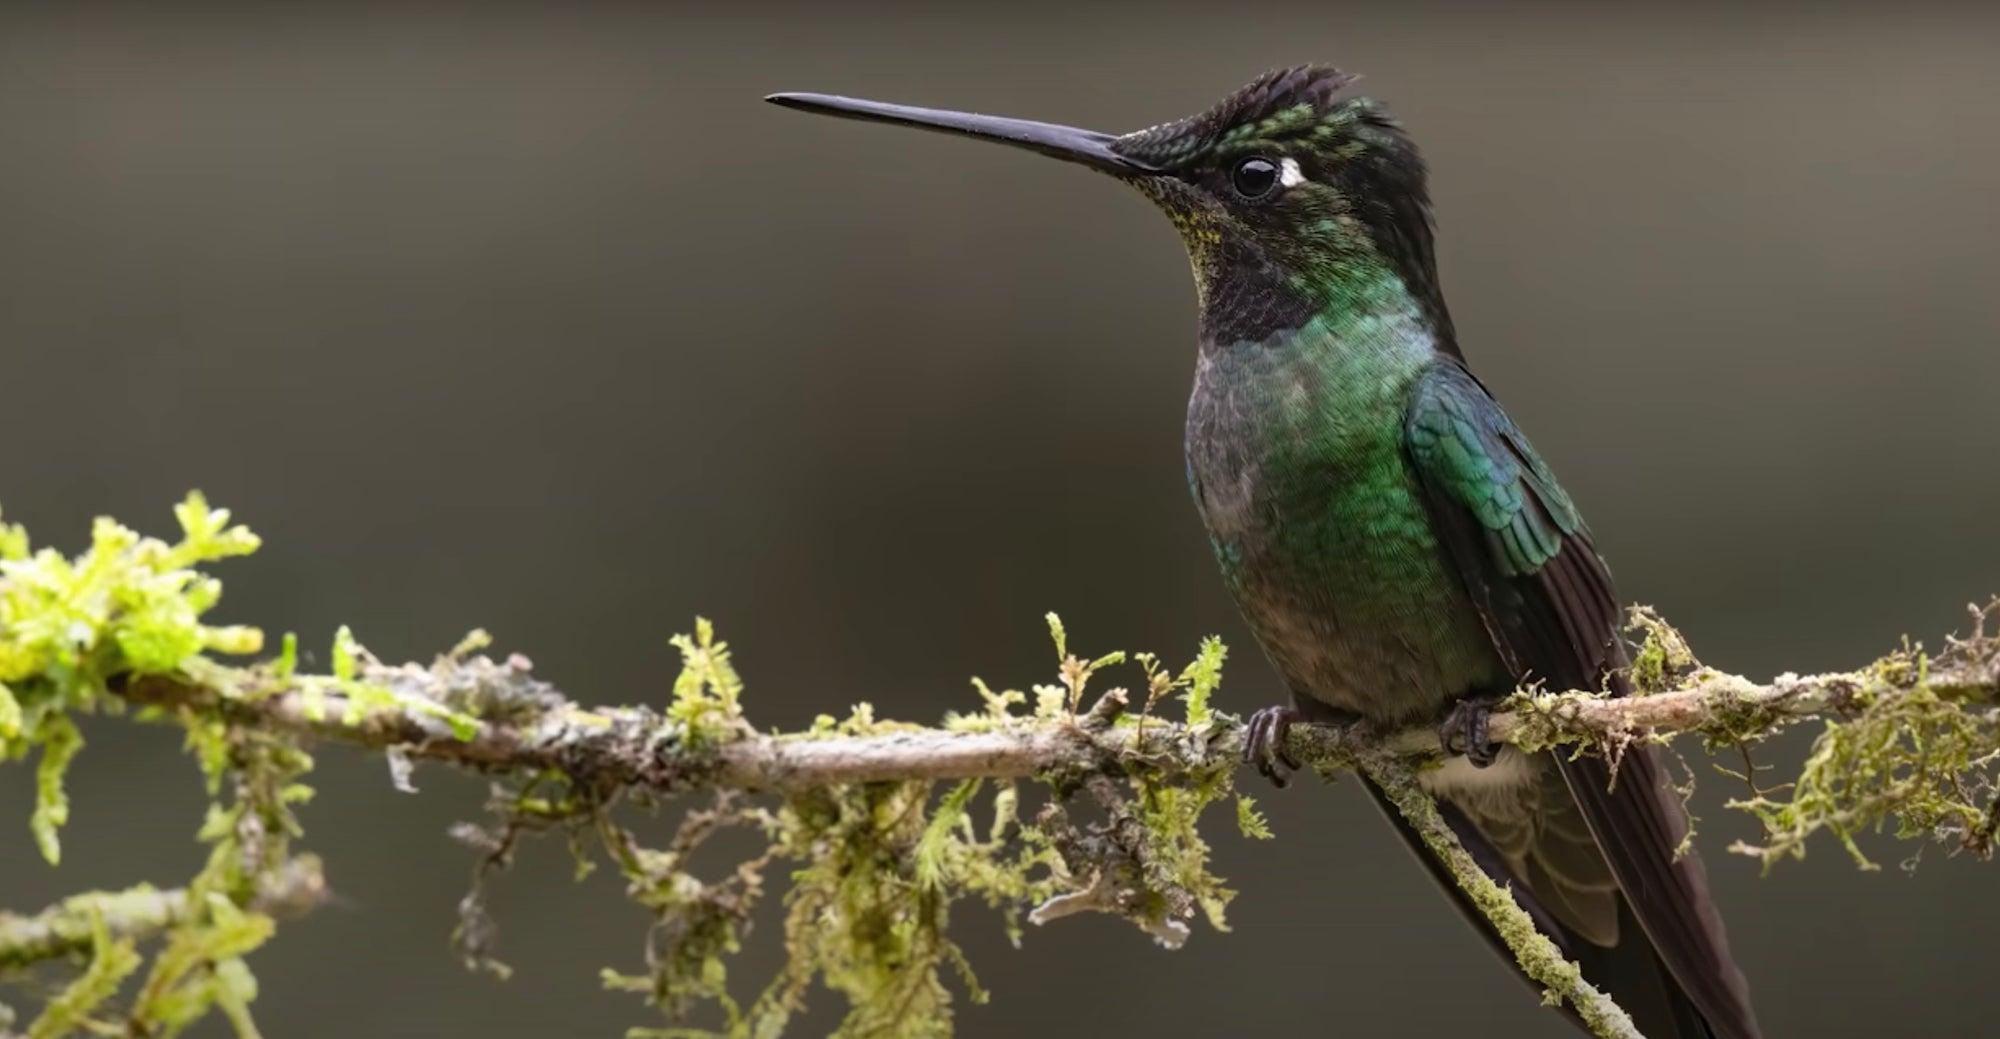 Alpha-Universe-Mark-Smith-Costa-Rica-Birds-Hummingbird.jpg